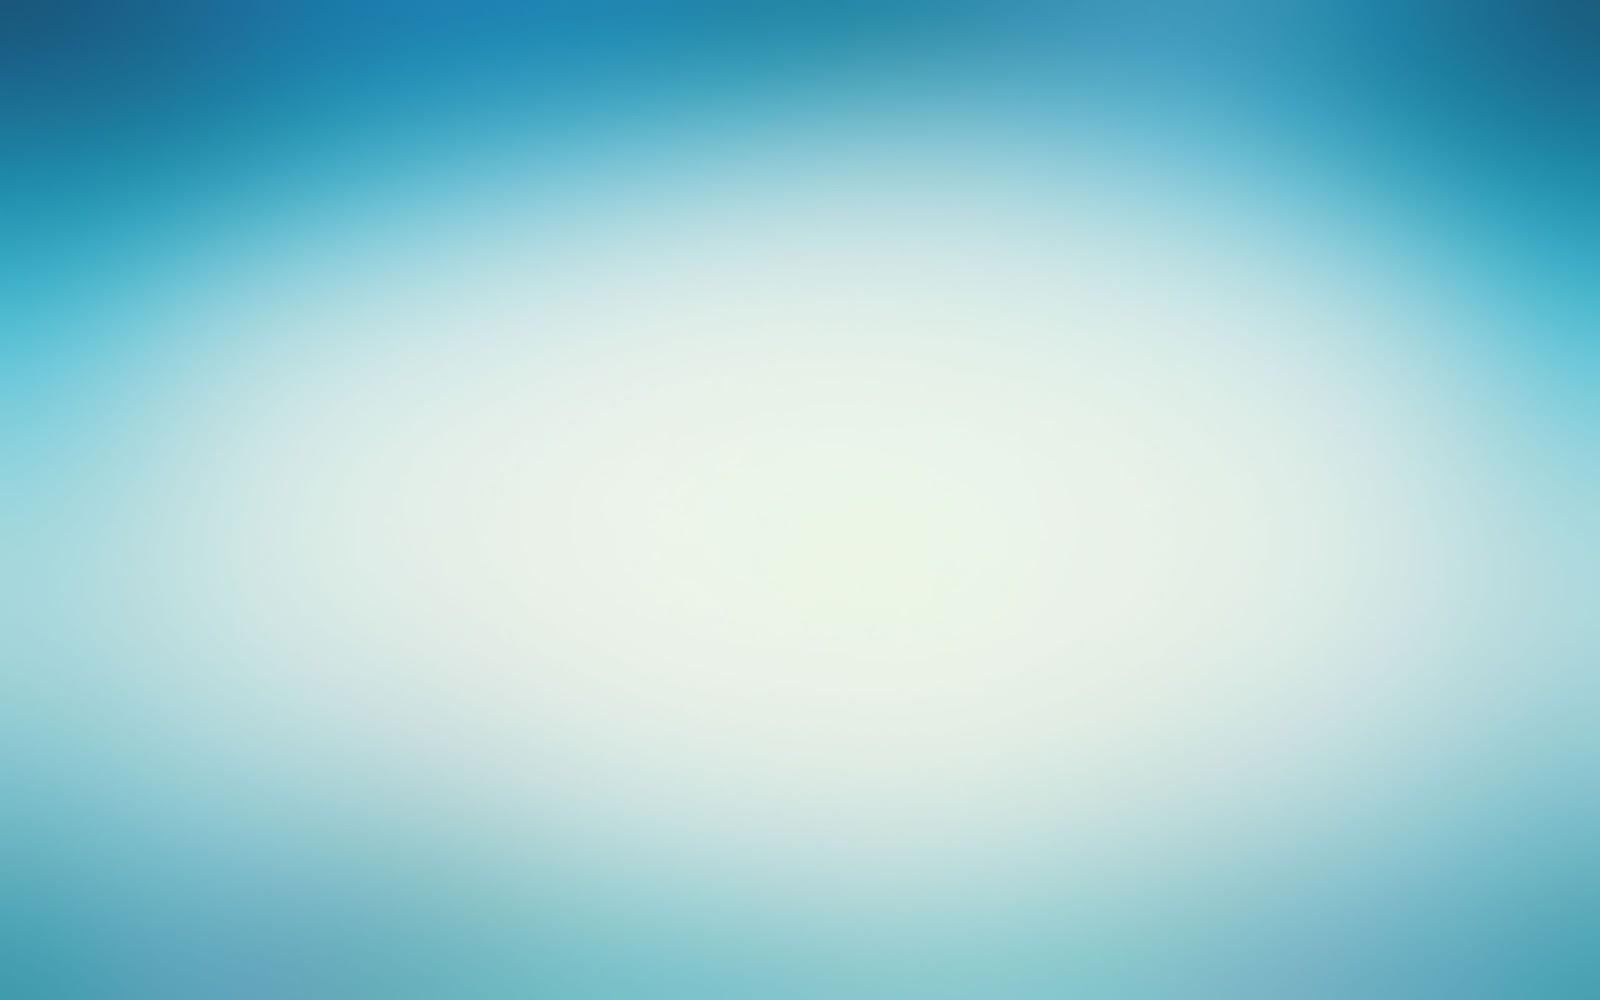 0161d50e-6100-4b4c-beb7-abd46974431a_fundo-azul5